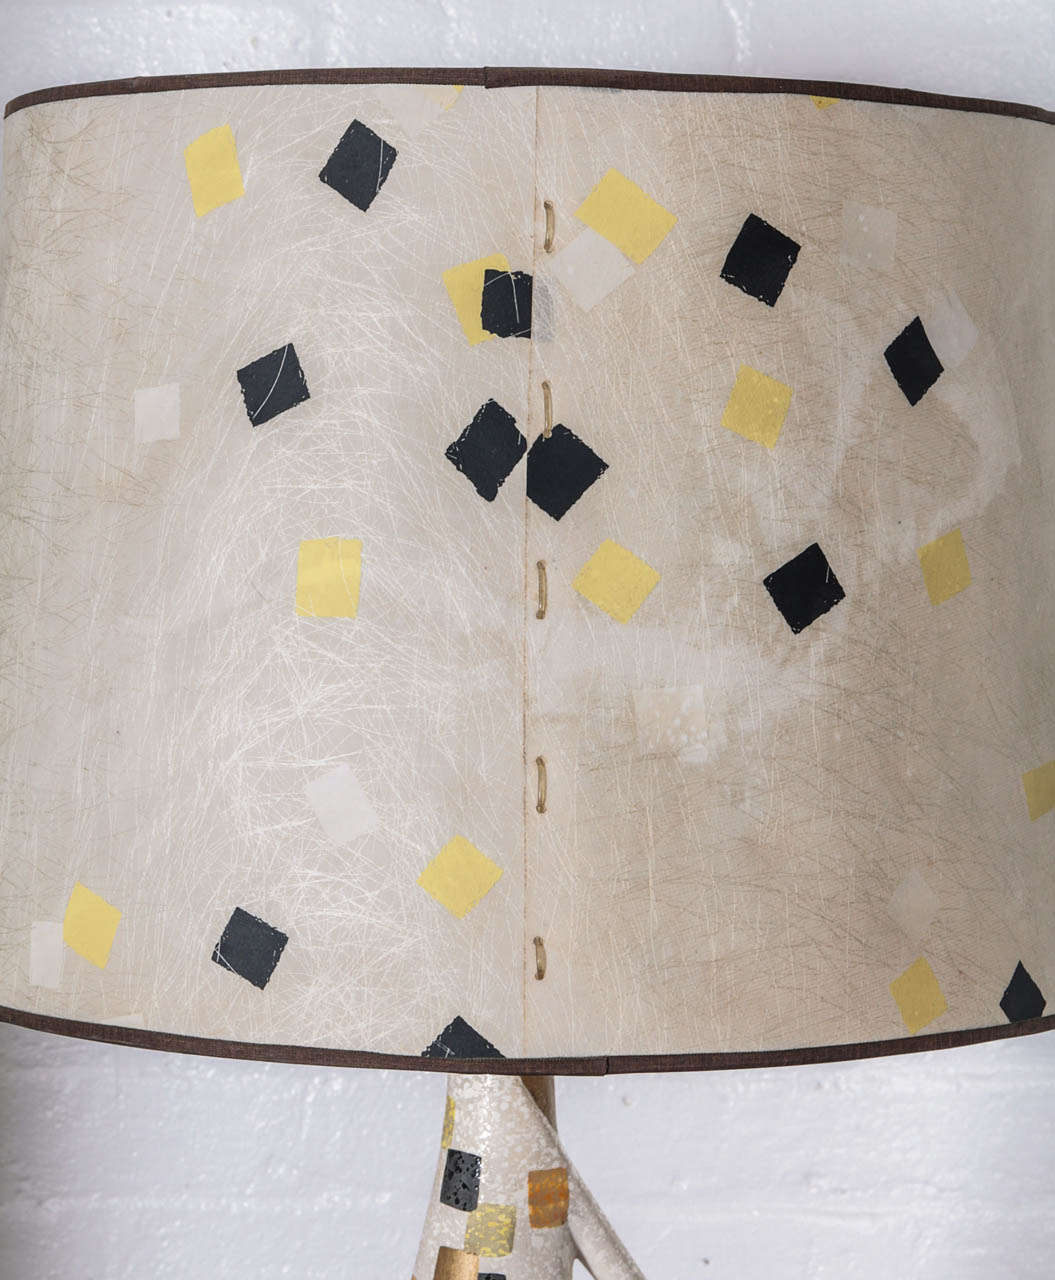 20th Century Tye of California Ceramic Table Lamp For Sale